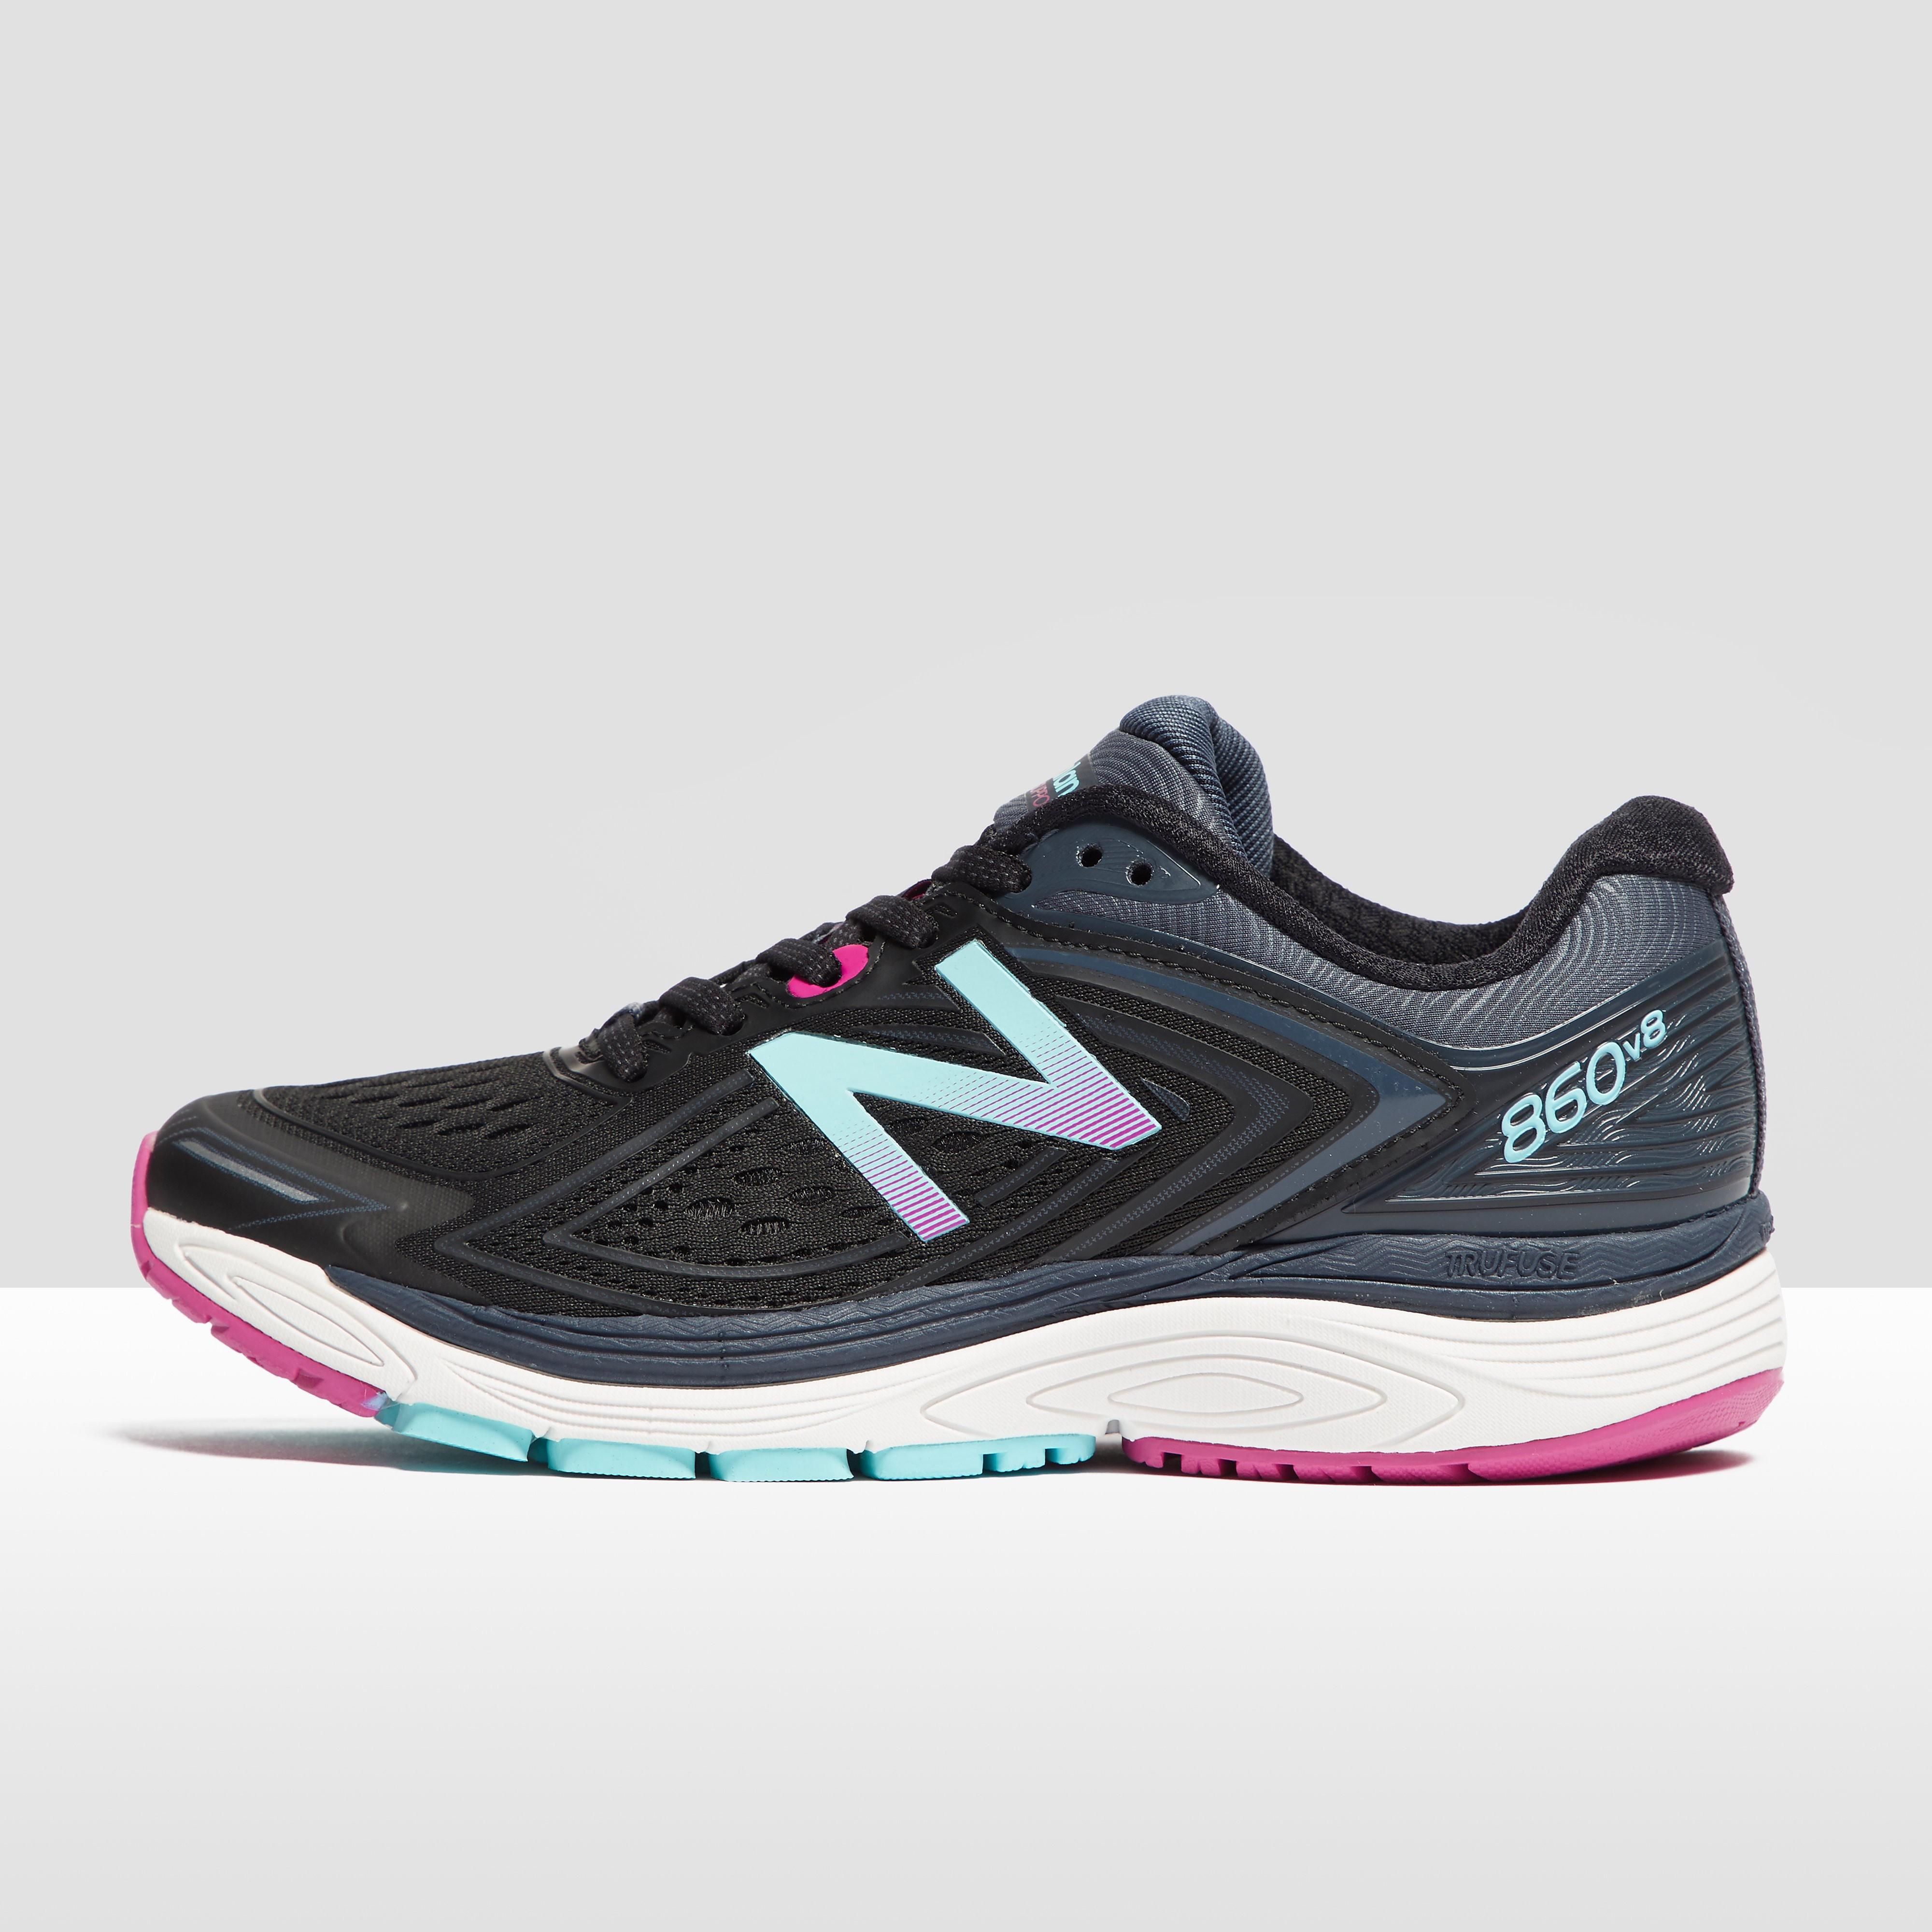 New Balance 860v8 Women's Running Shoes